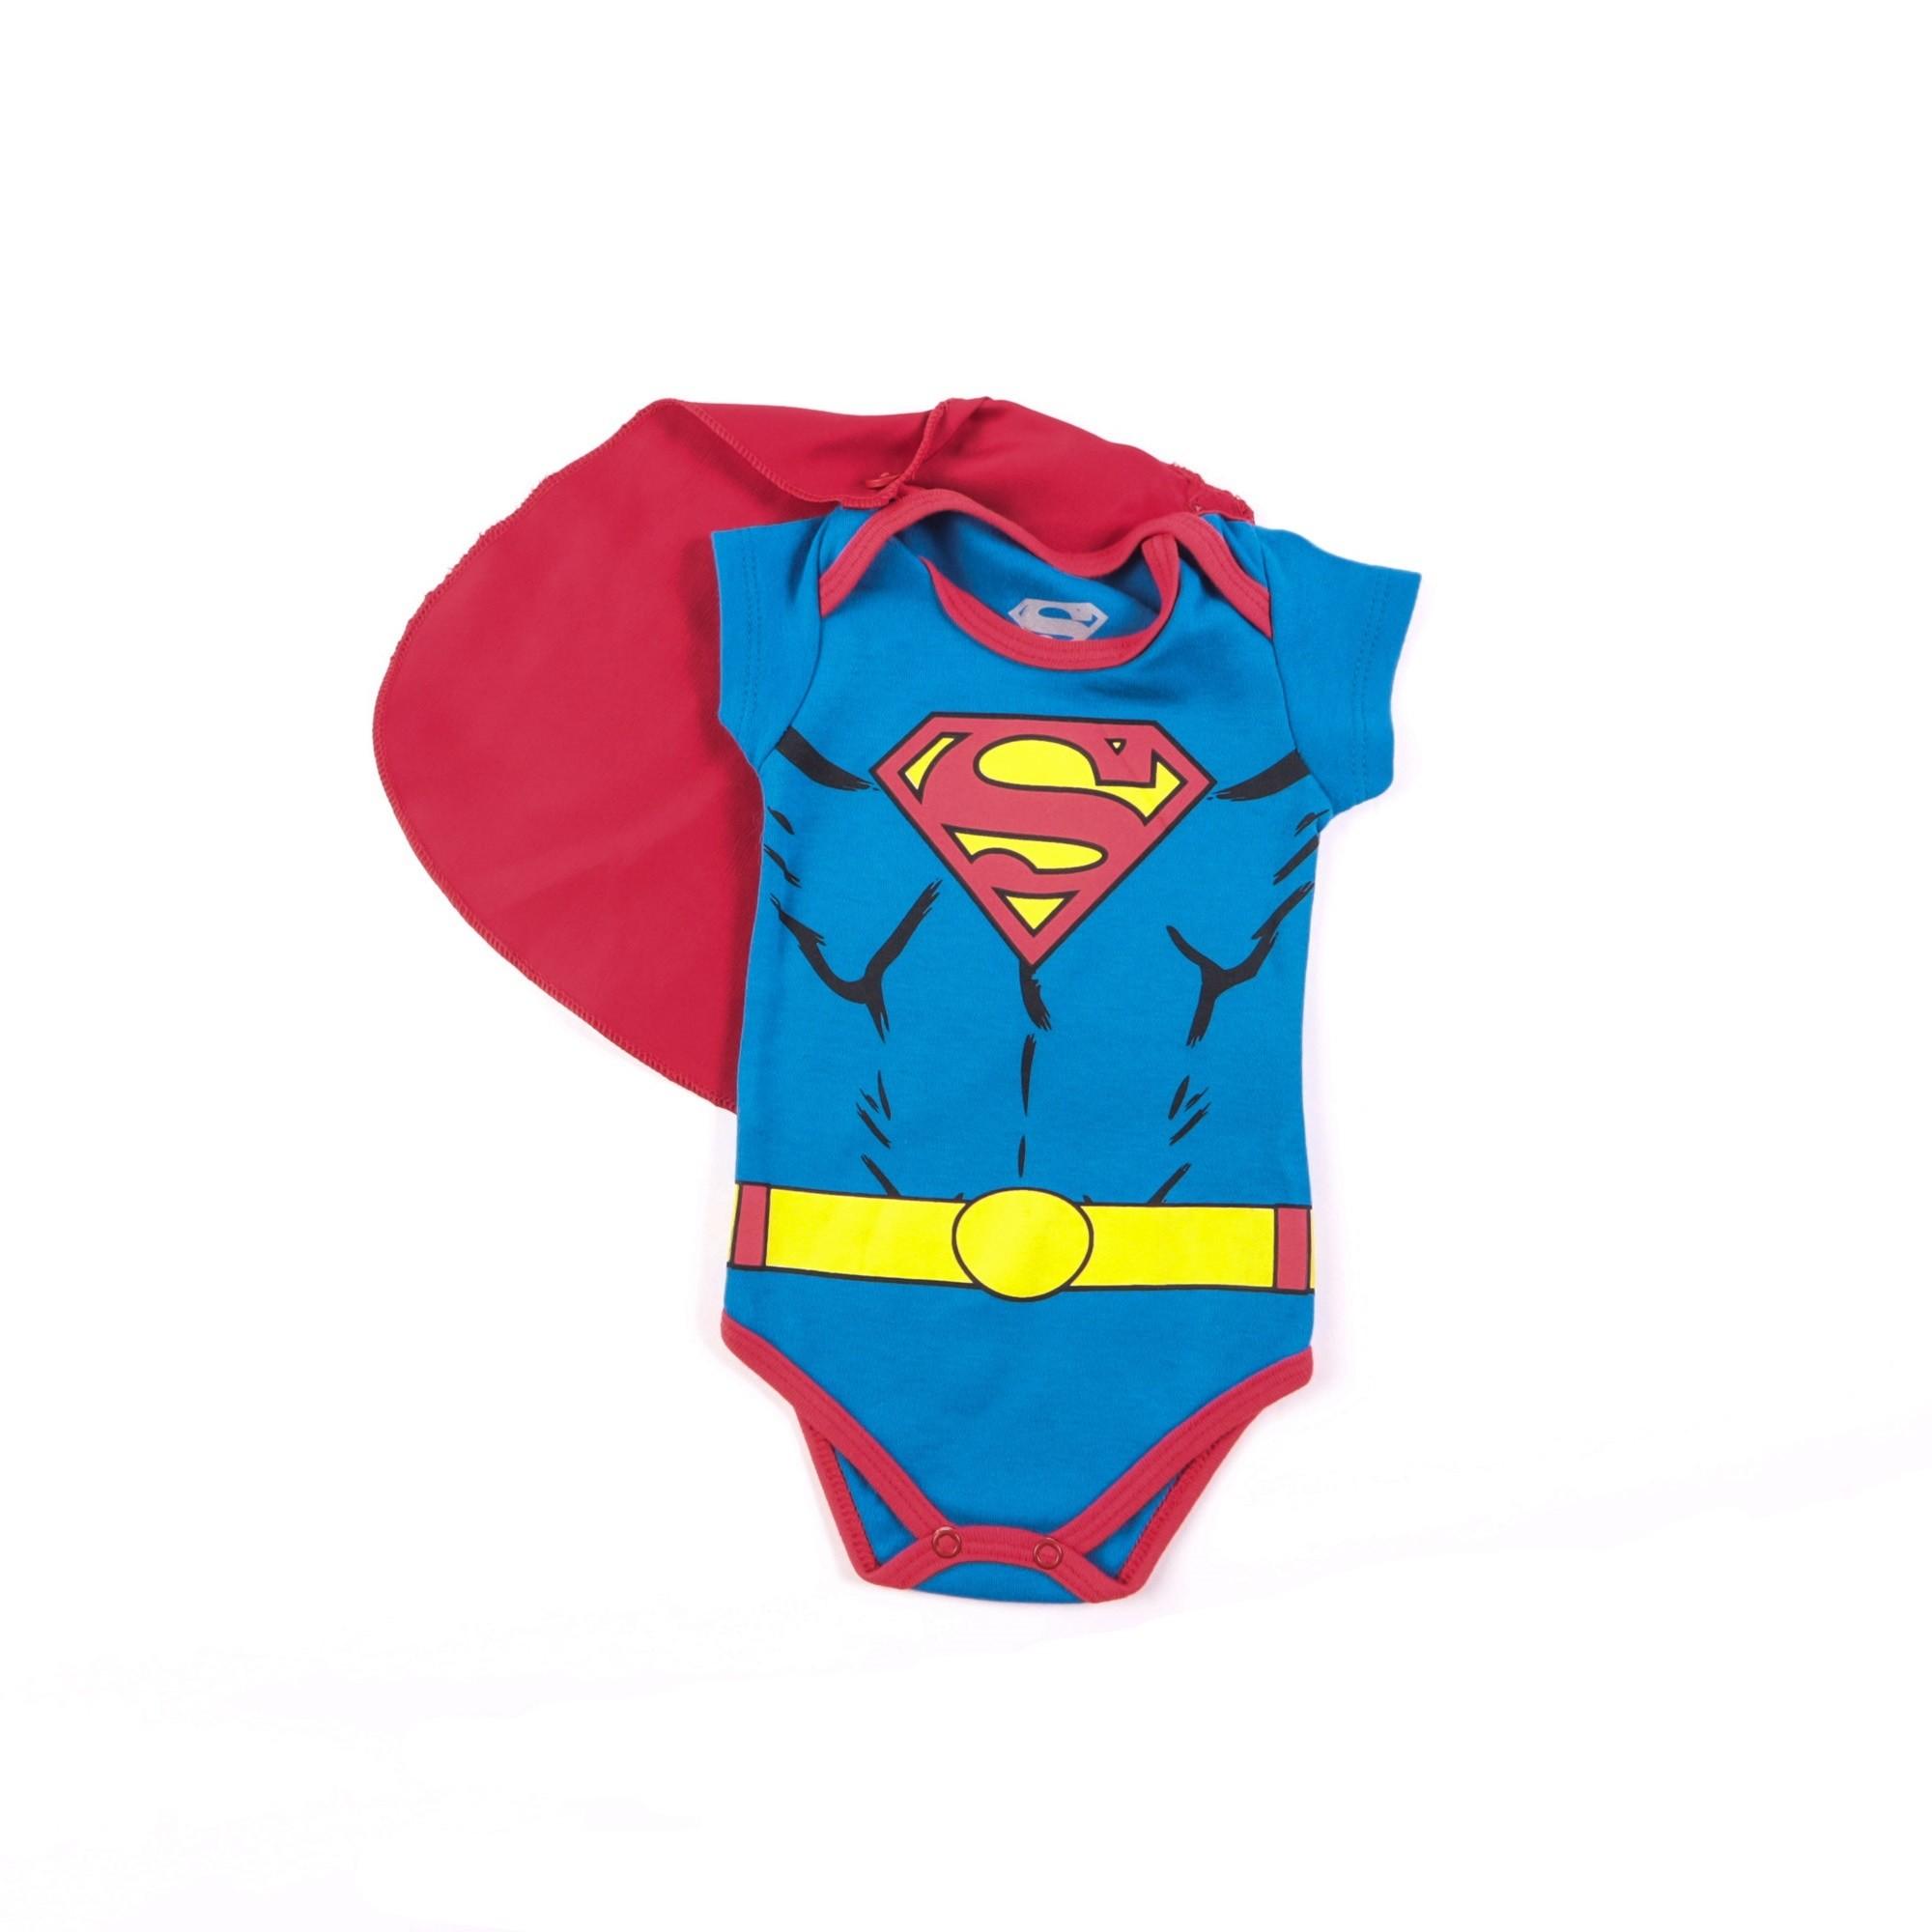 Body Superman Com Capa M/G - Marlan